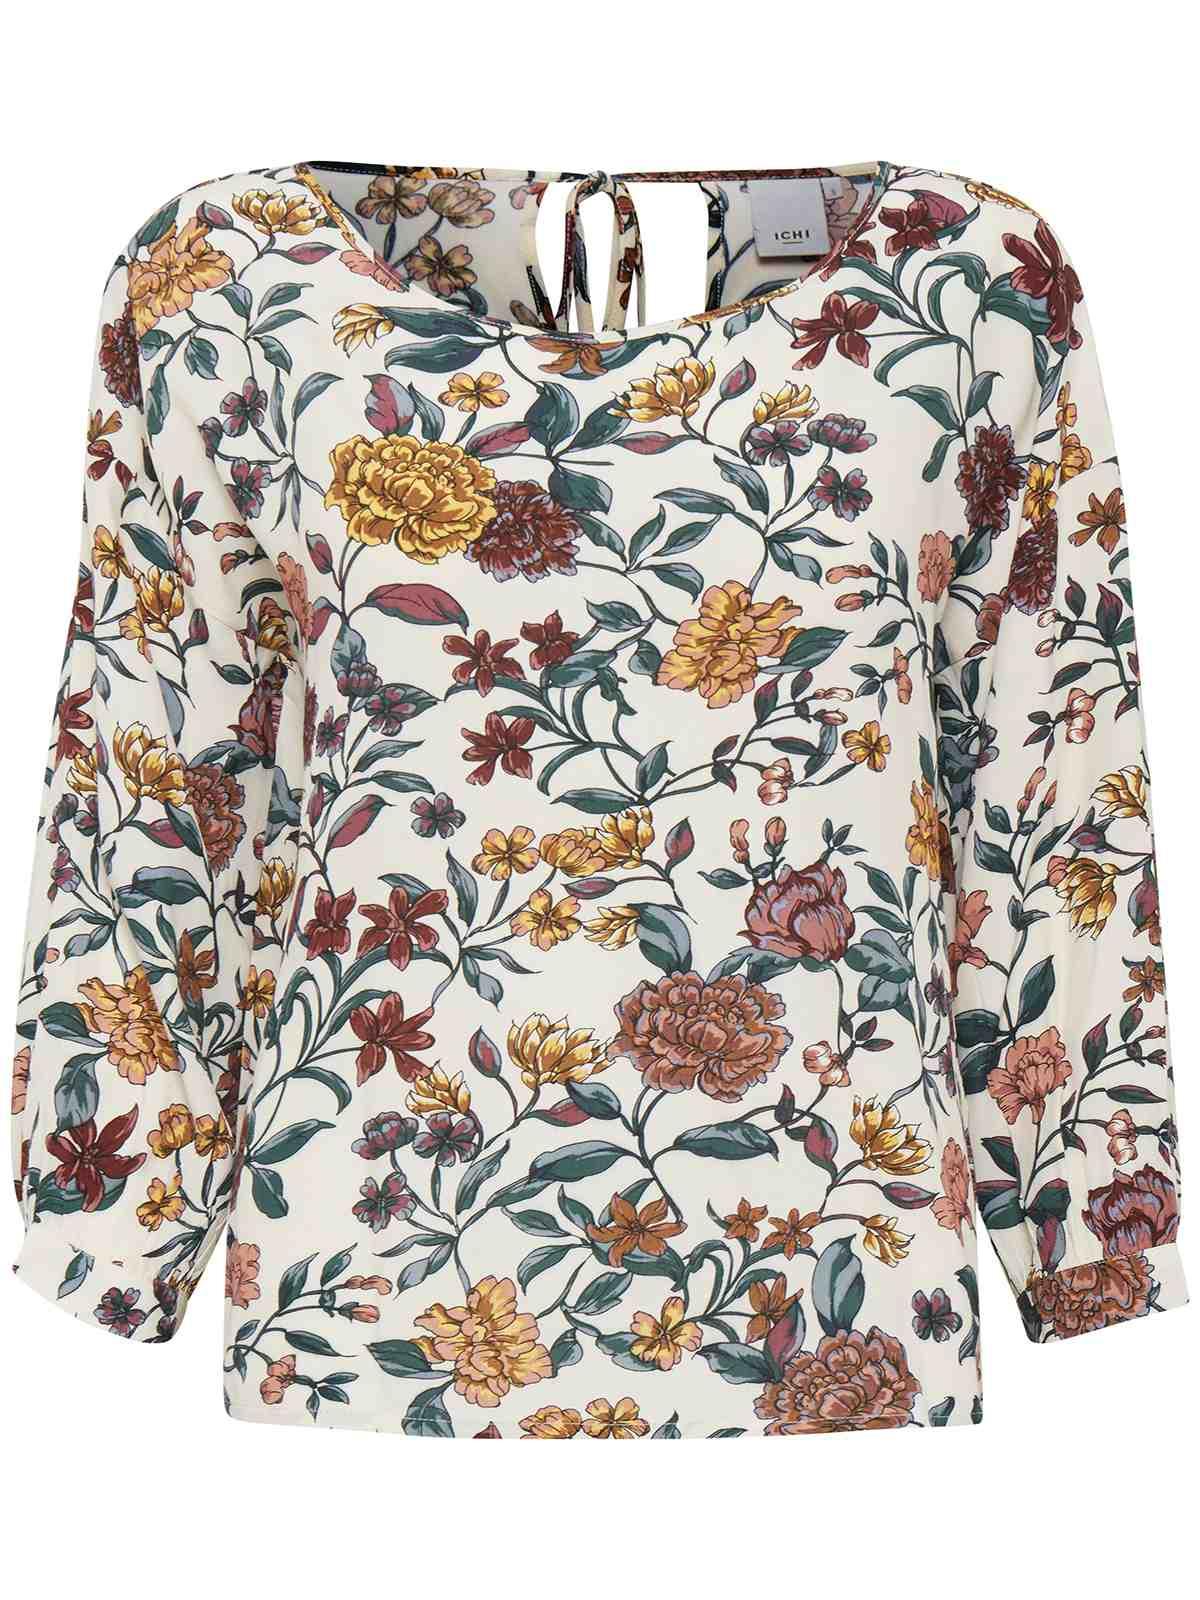 cb7ba49780f1c5 Bryce Top - Katie Kerr - Women's Clothing - UK